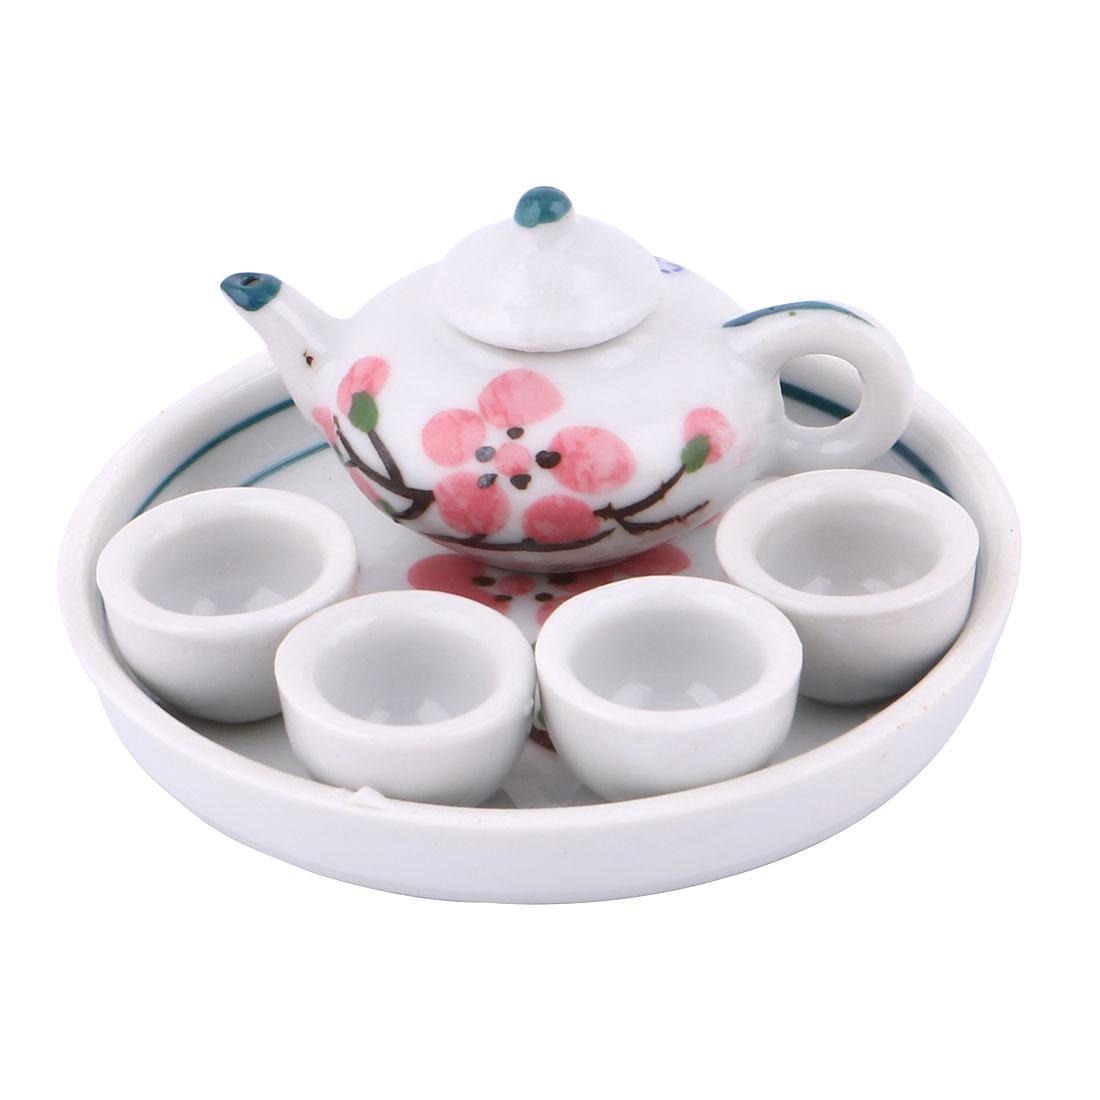 Home Ceramic Plum Blossom Printed Mini Plate Teapot Cup Tea Set